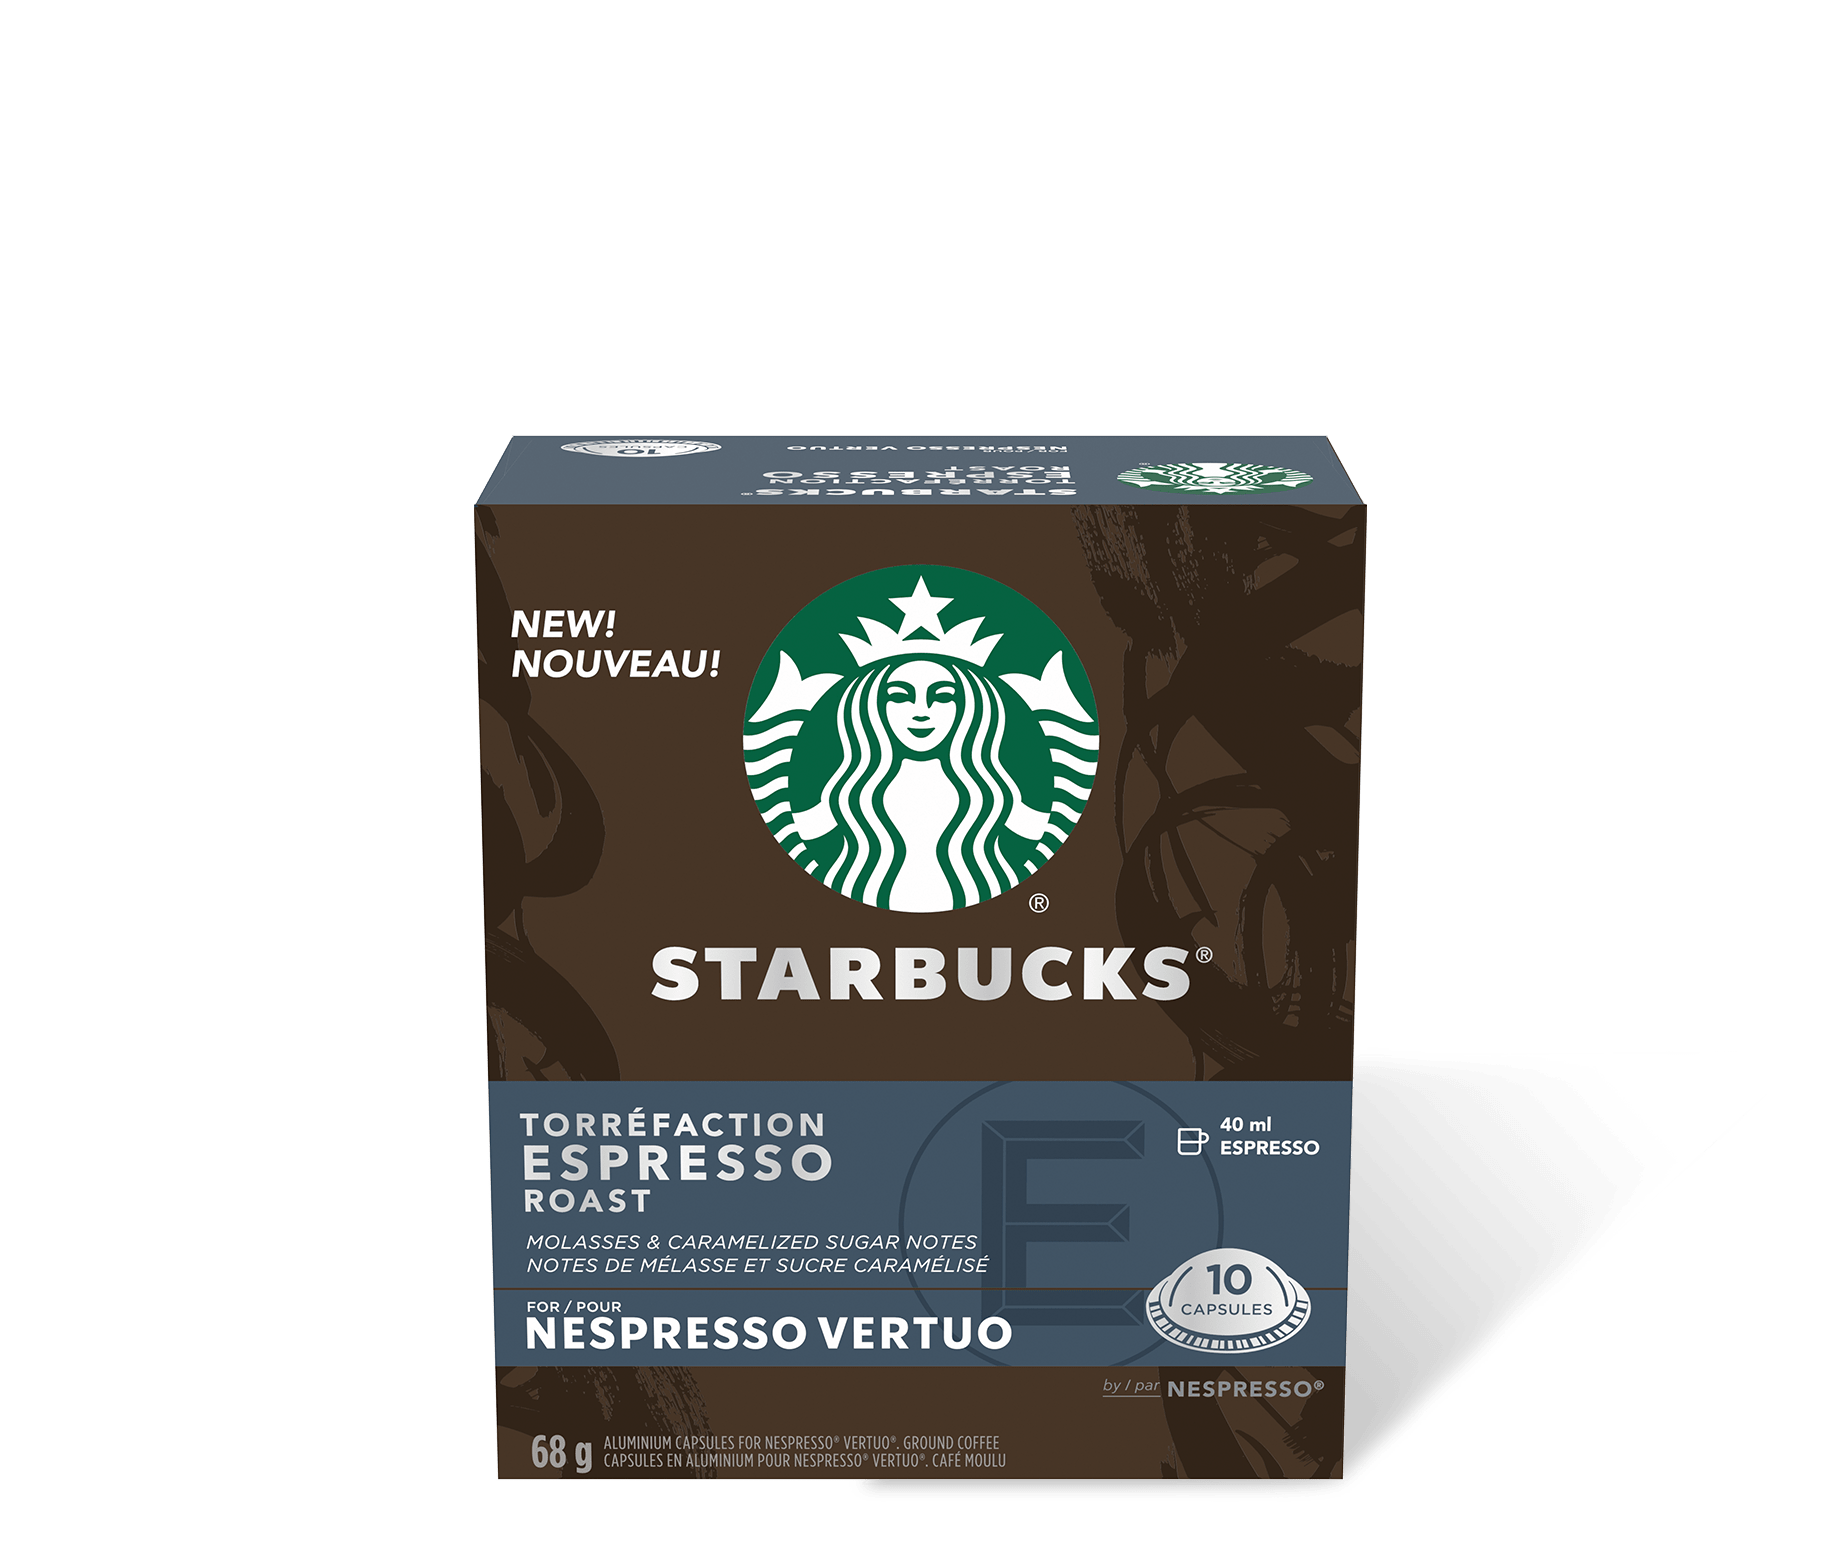 Starbucks by Nespresso Vertuo Espresso Roast